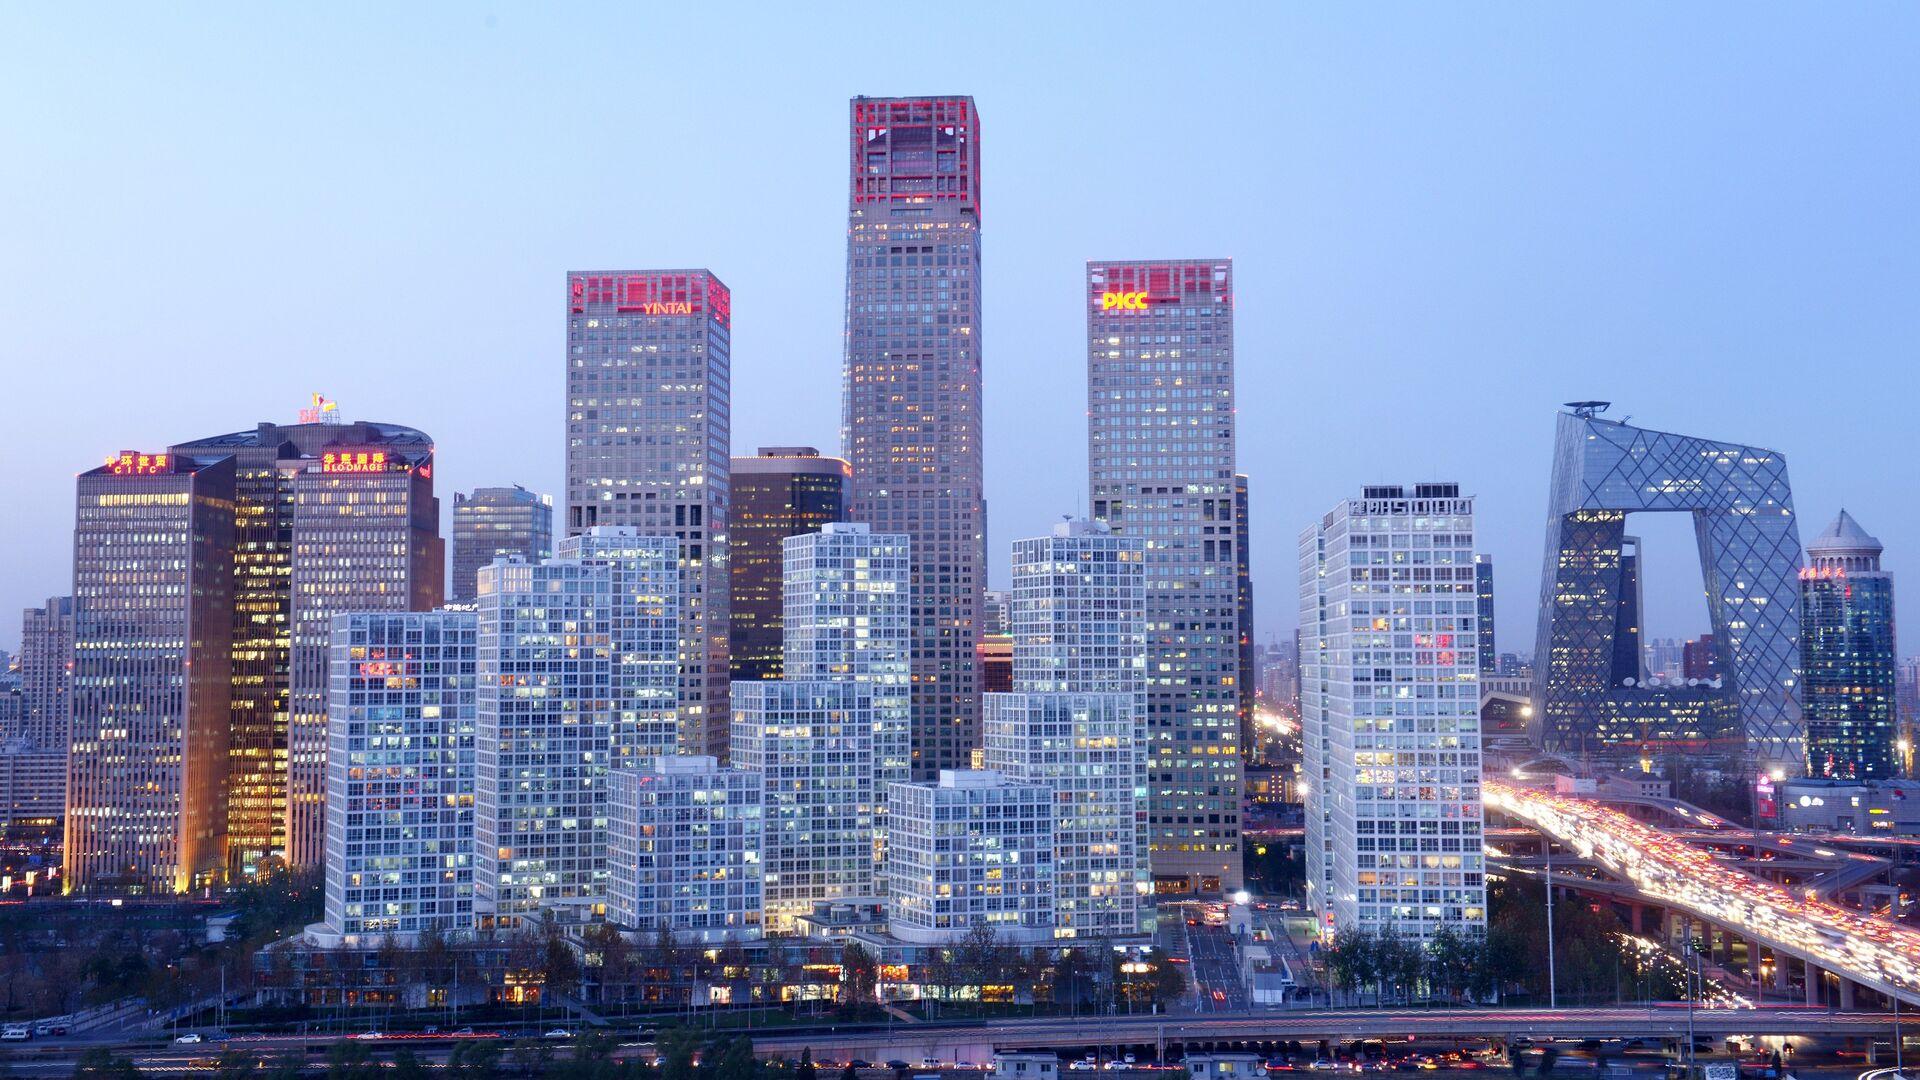 Pekín, la capital de China - Sputnik Mundo, 1920, 15.09.2021